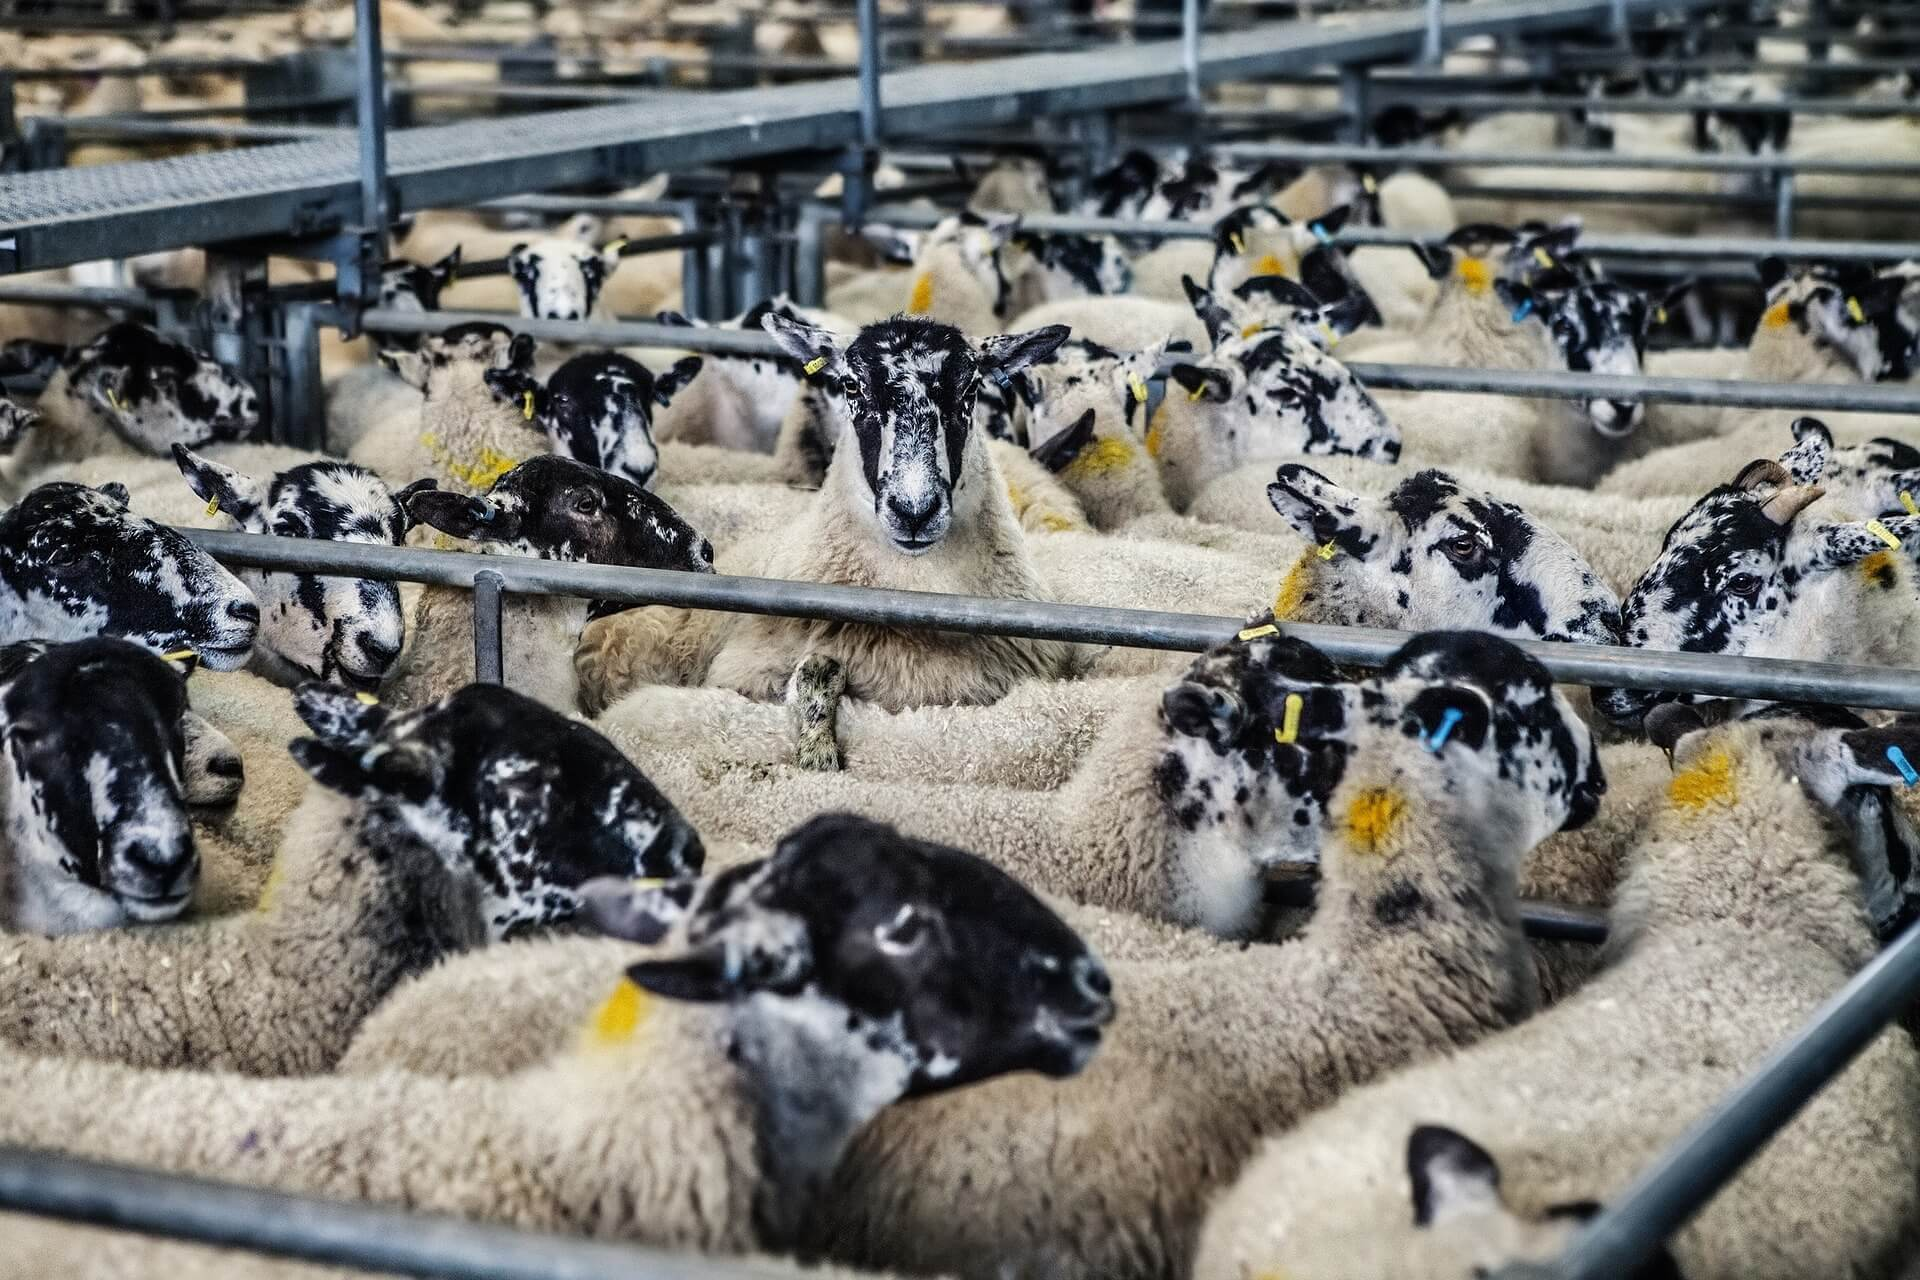 sheep-678196_1920 (1)